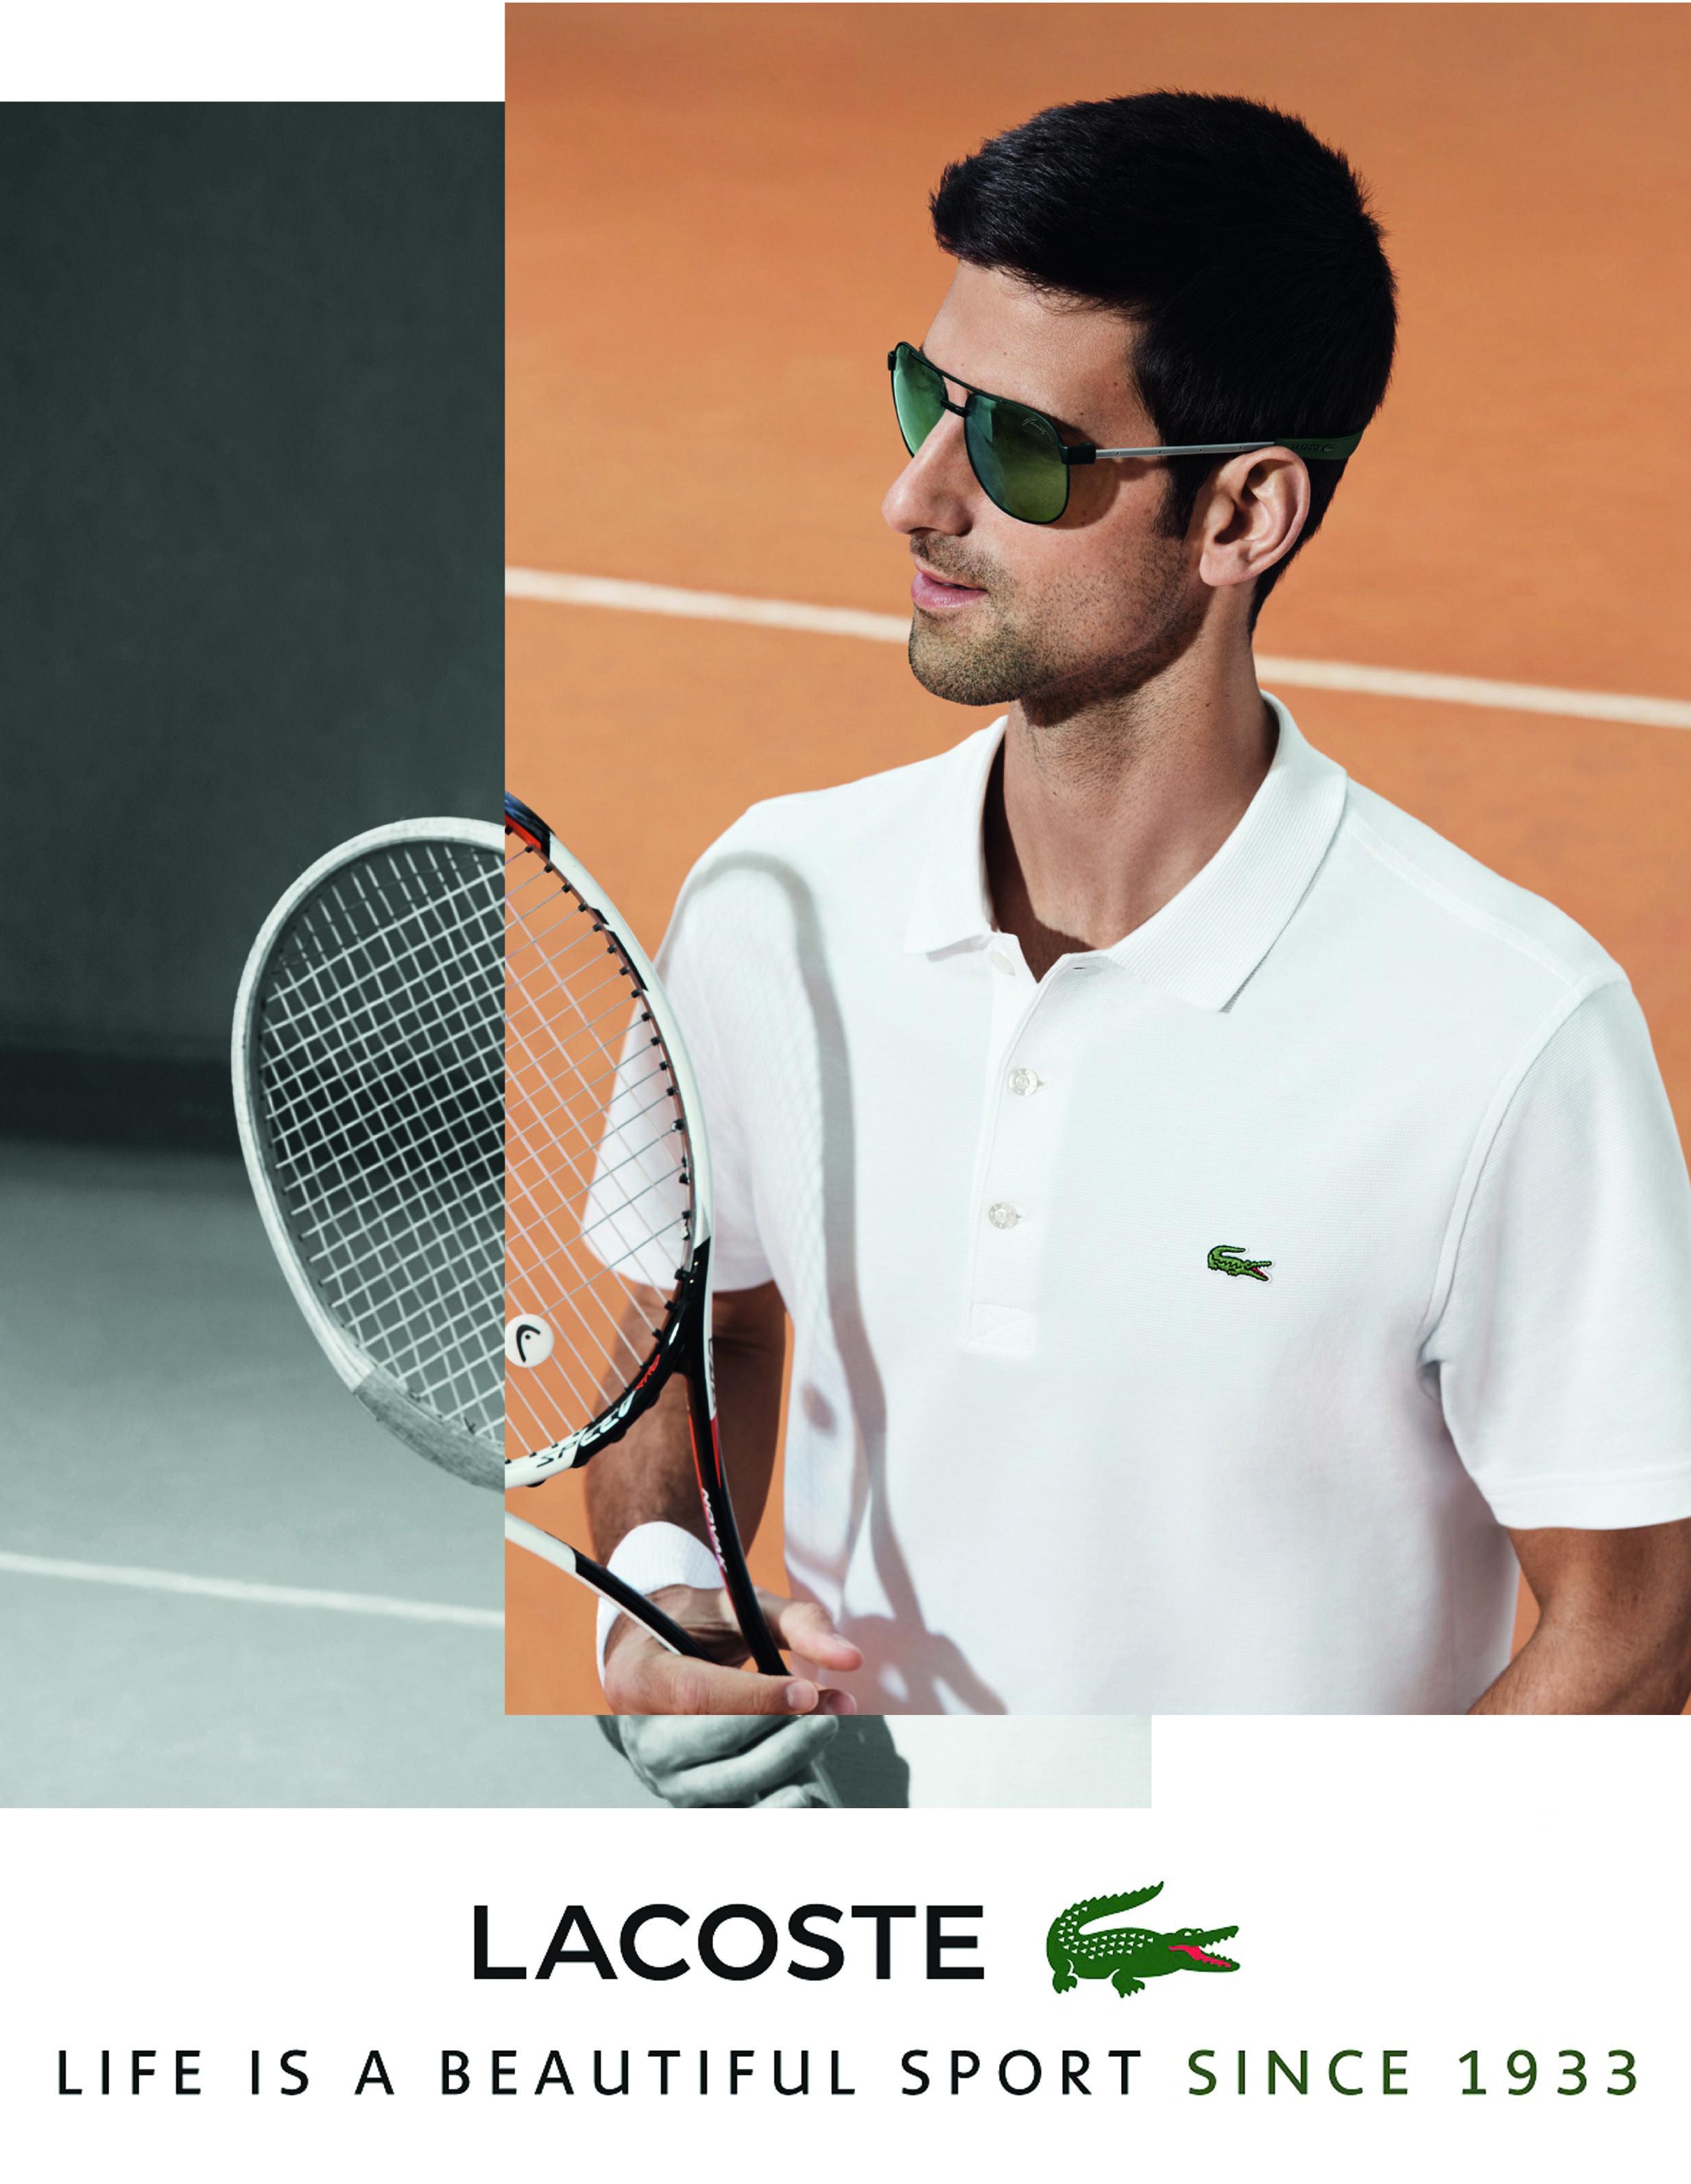 606ef96f0d2e Lacoste Magnetic Lock Sunglasses. Worn by Novak Djokovic. Lens by ZEISS.   AlMokhtar